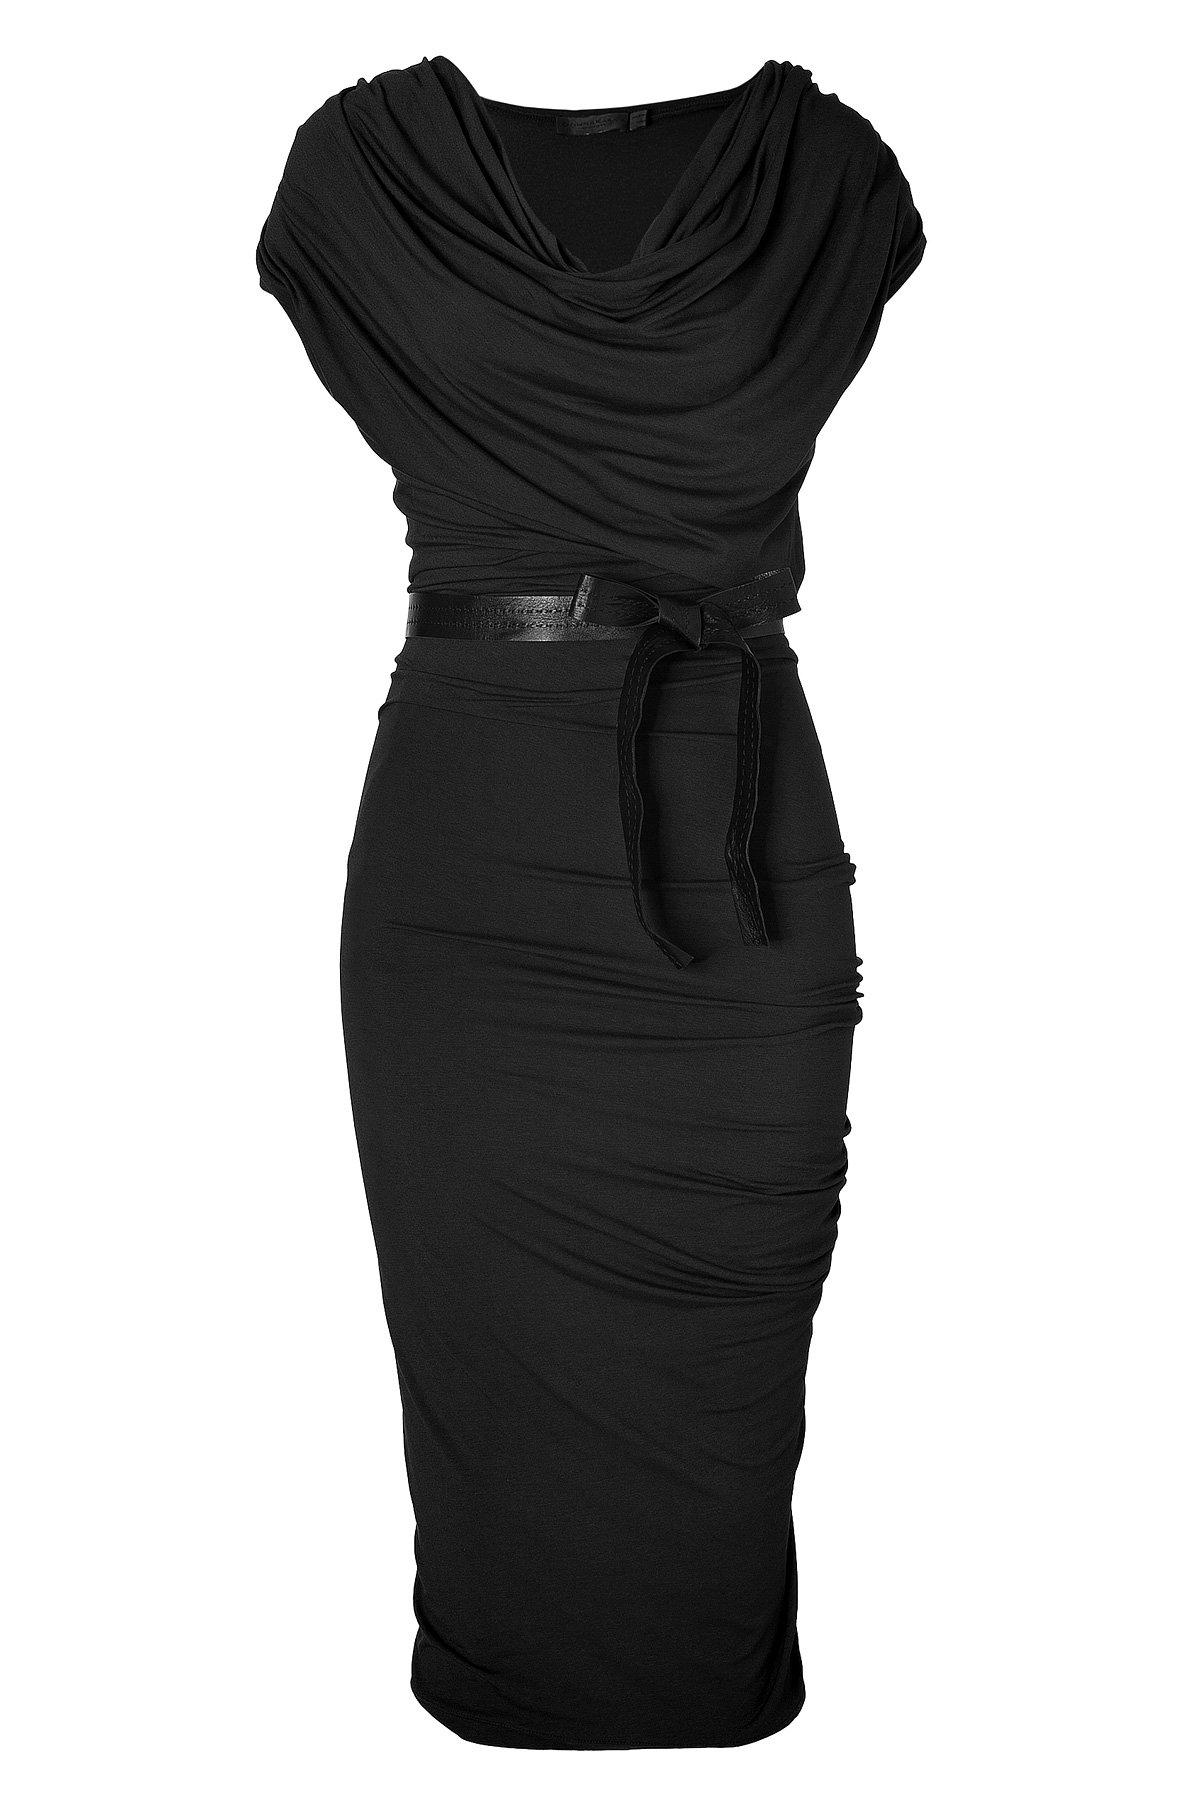 Donna Karan Black Draped Jersey Dress With Belt In Black